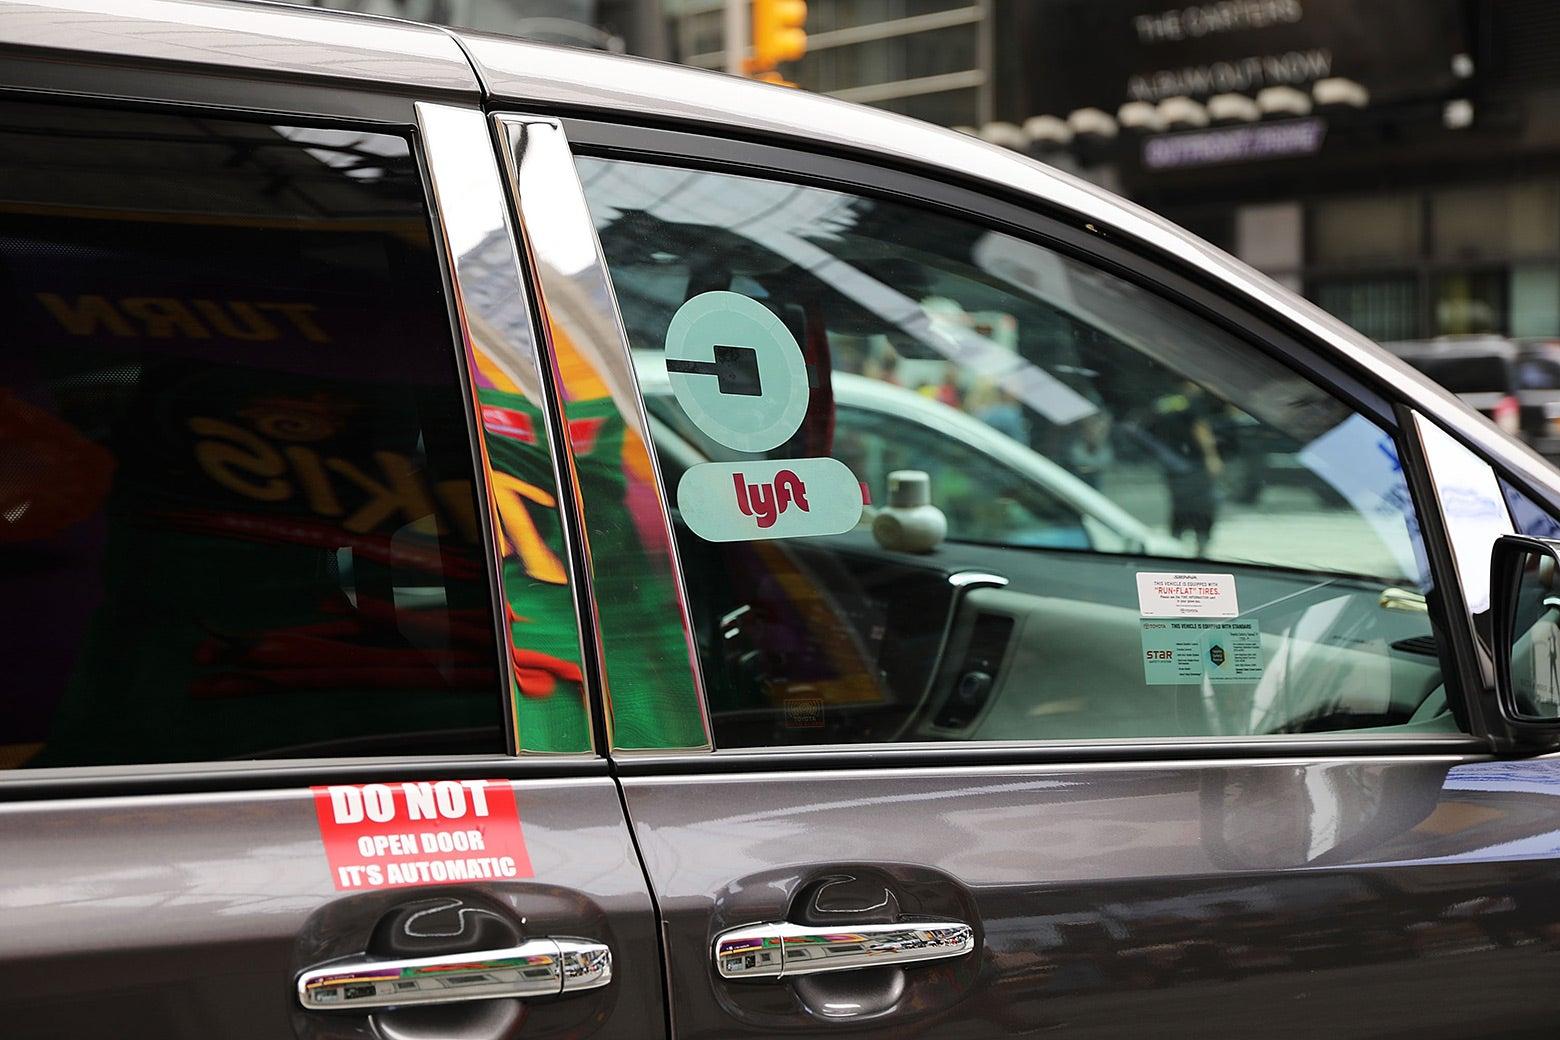 An Uber/Lyft ride-hailing vehicle in New York City.